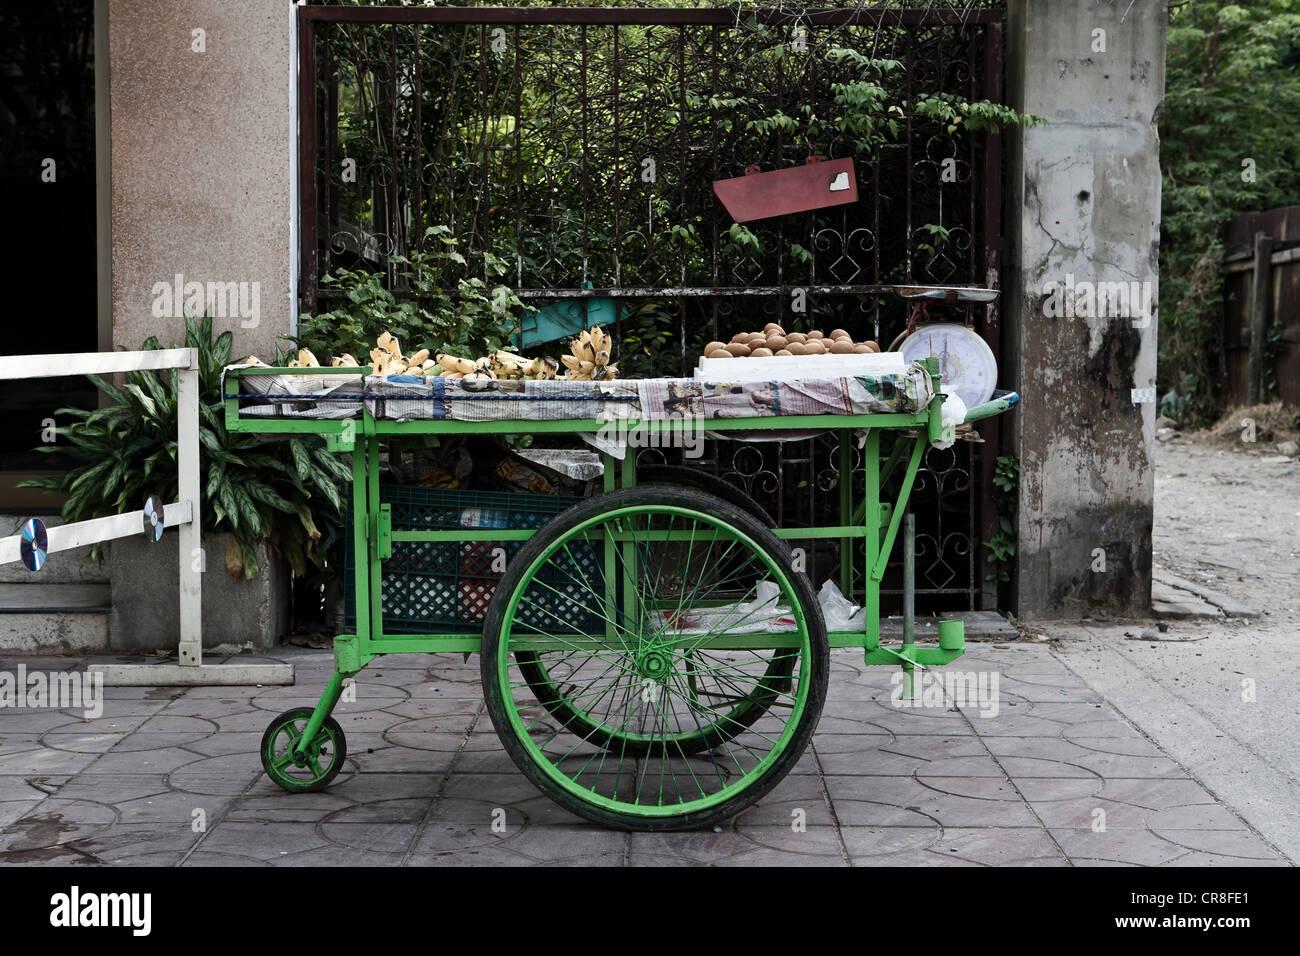 Green cart parked in market, Bangkok, Thailand - Stock Image